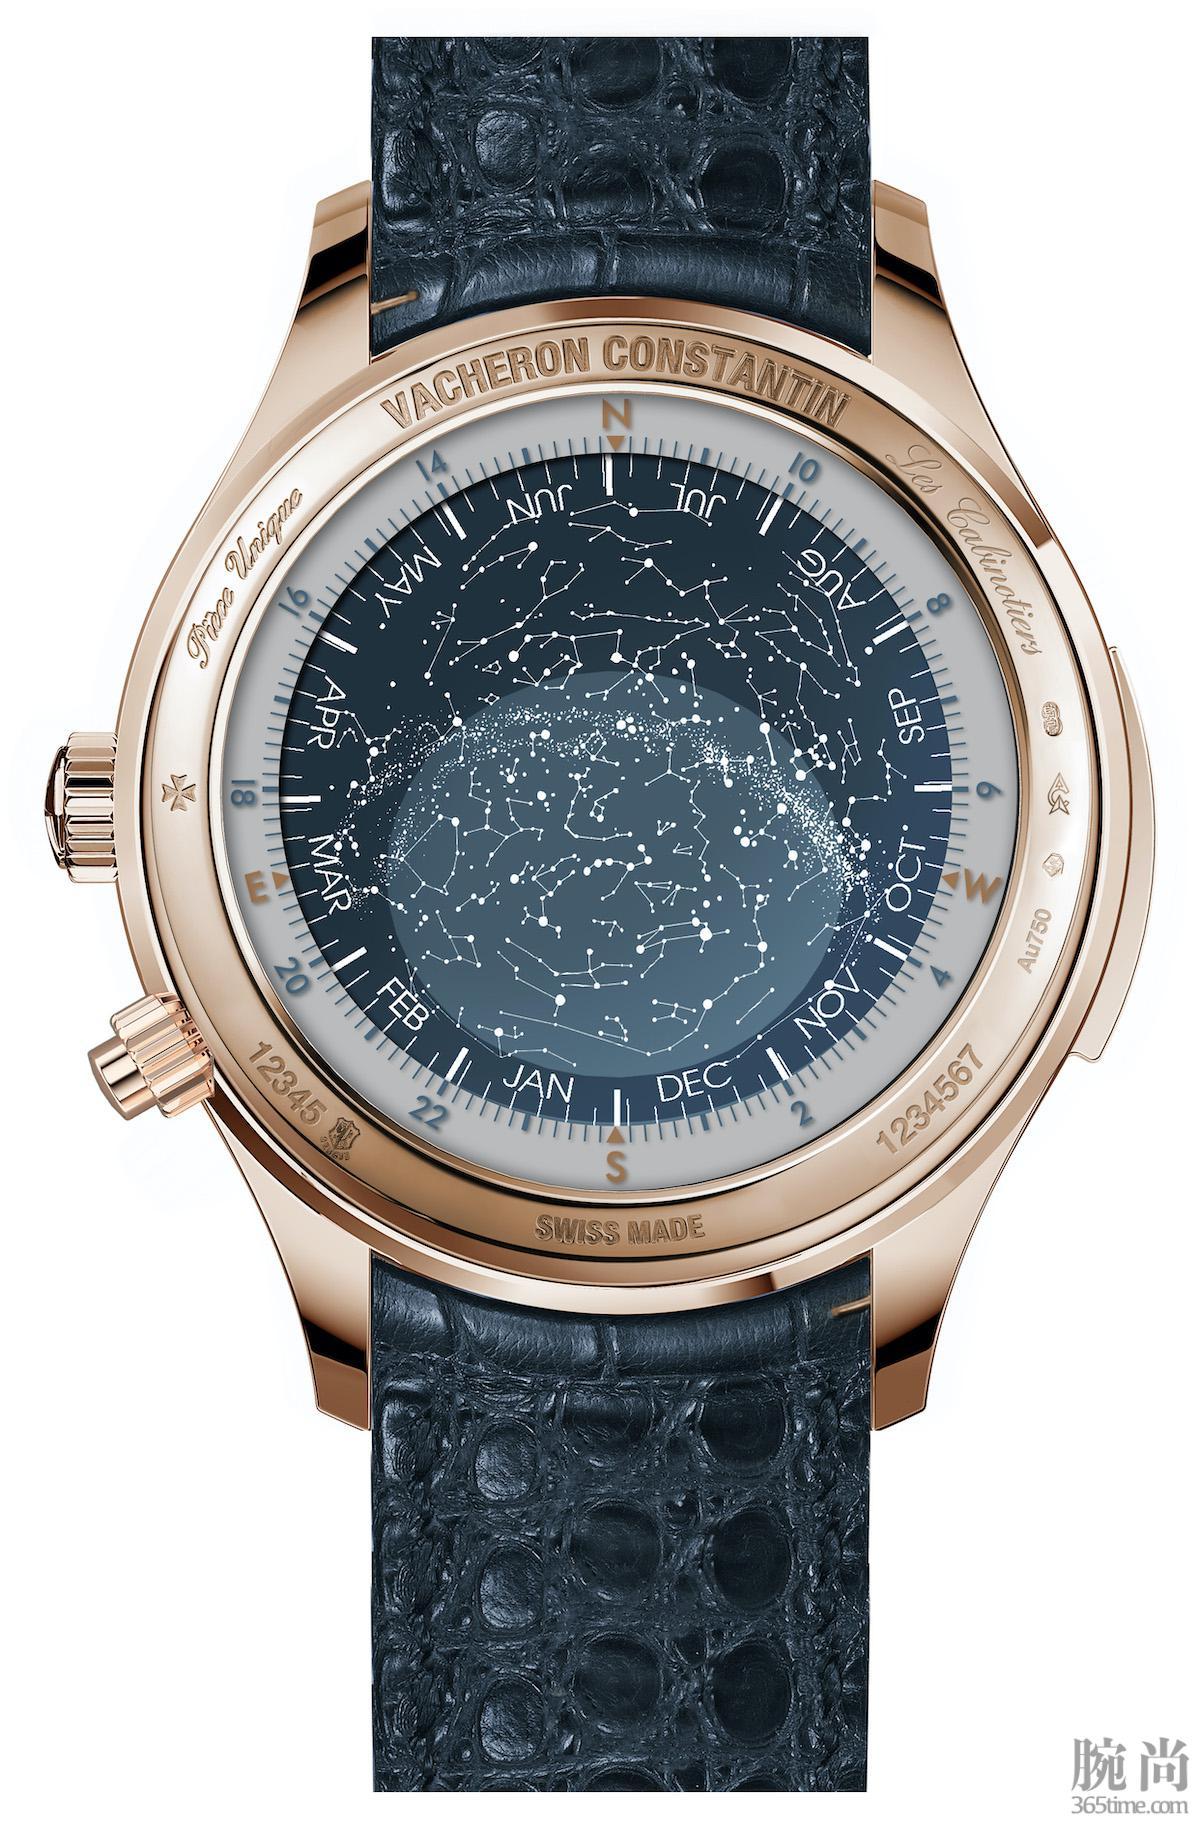 vac-a-celestial-note-9730c-000r-b493-back-277377.jpg